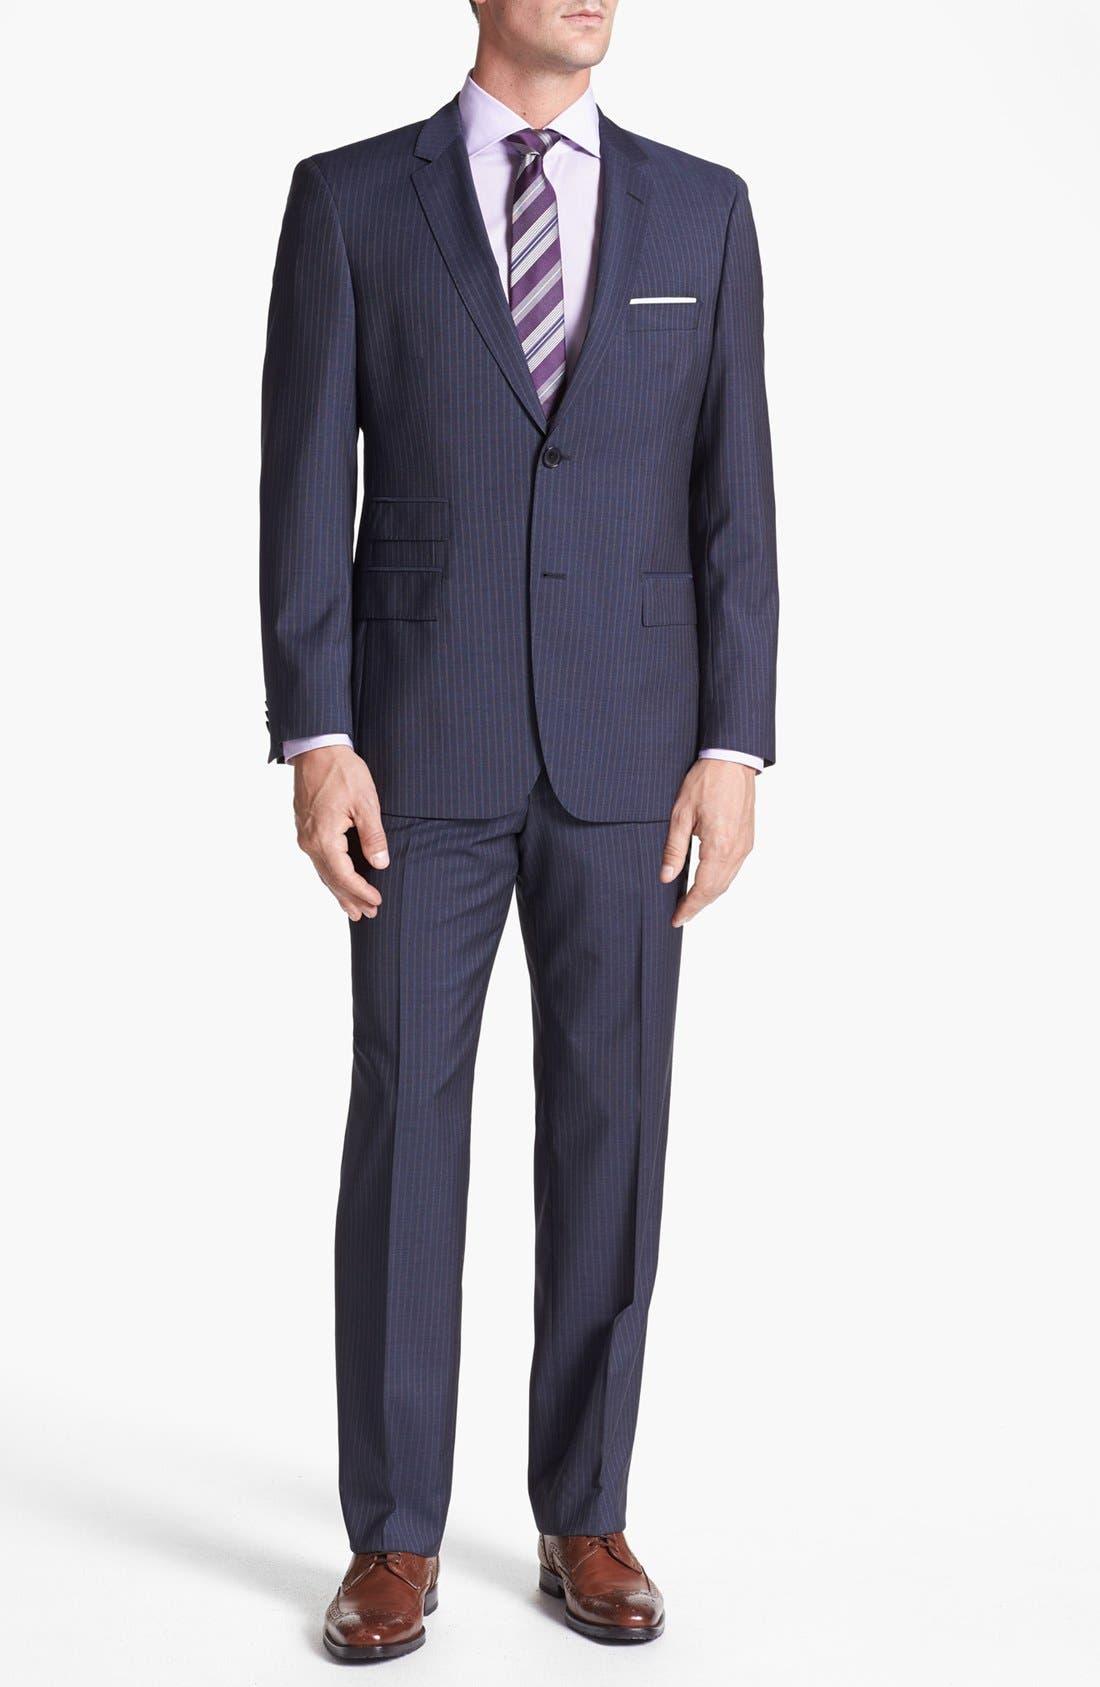 Main Image - BOSS HUGO BOSS 'Edison/Power' Classic Fit Stripe Suit